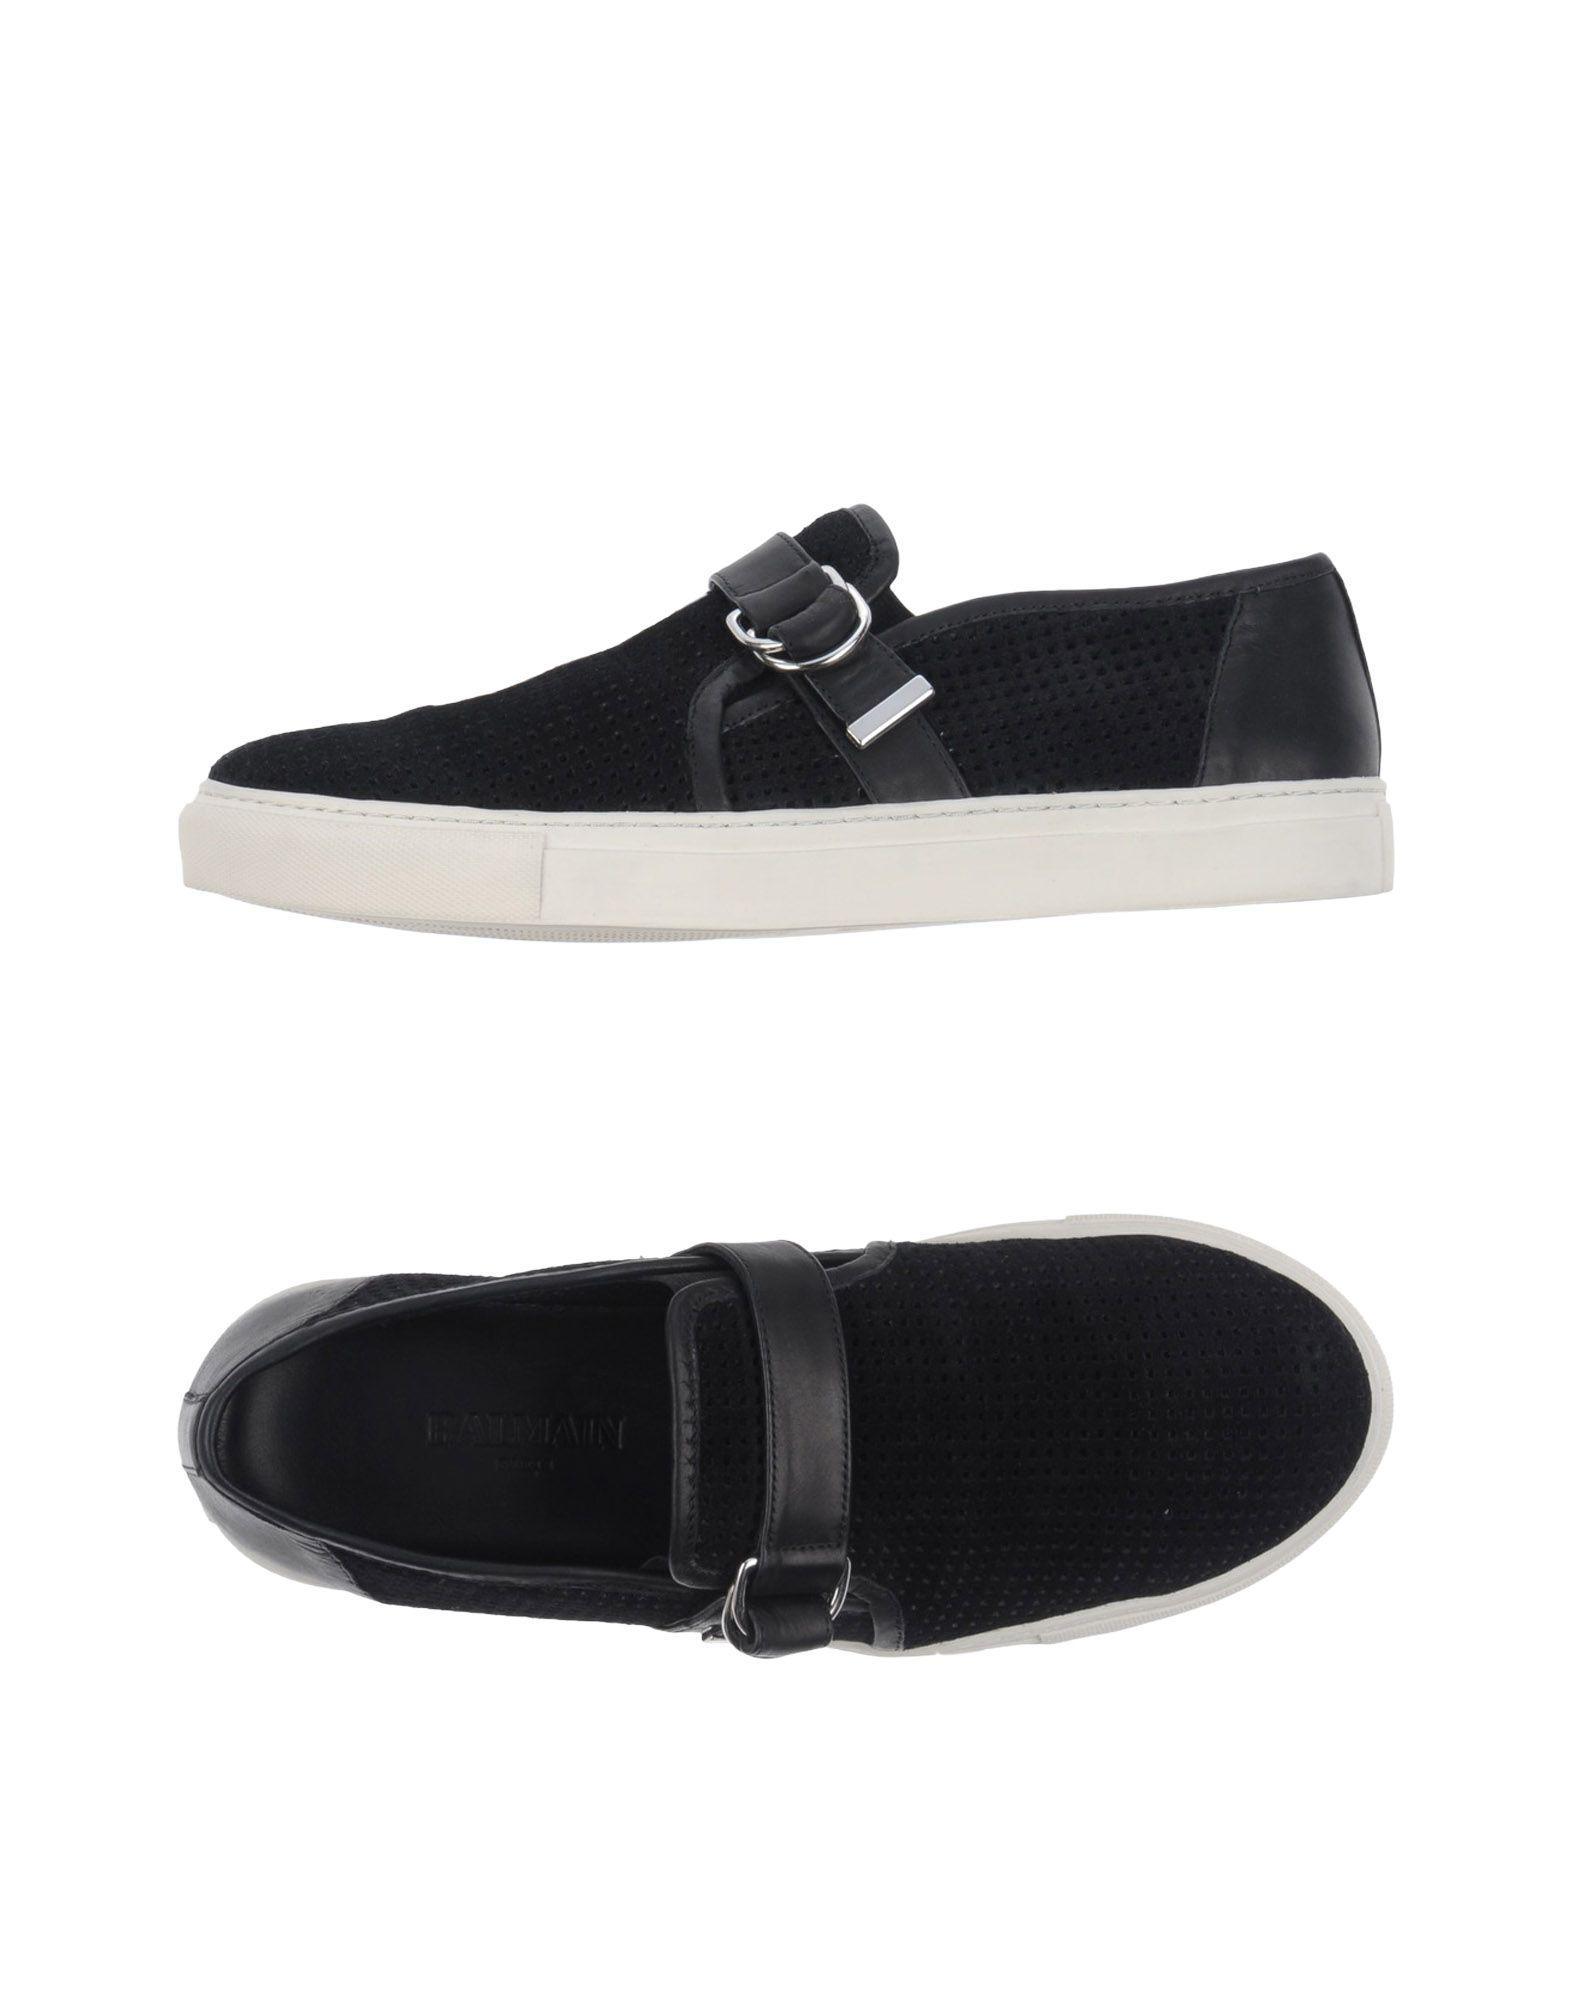 09253080ce Lyst - Balmain Low-tops & Sneakers in Black for Men